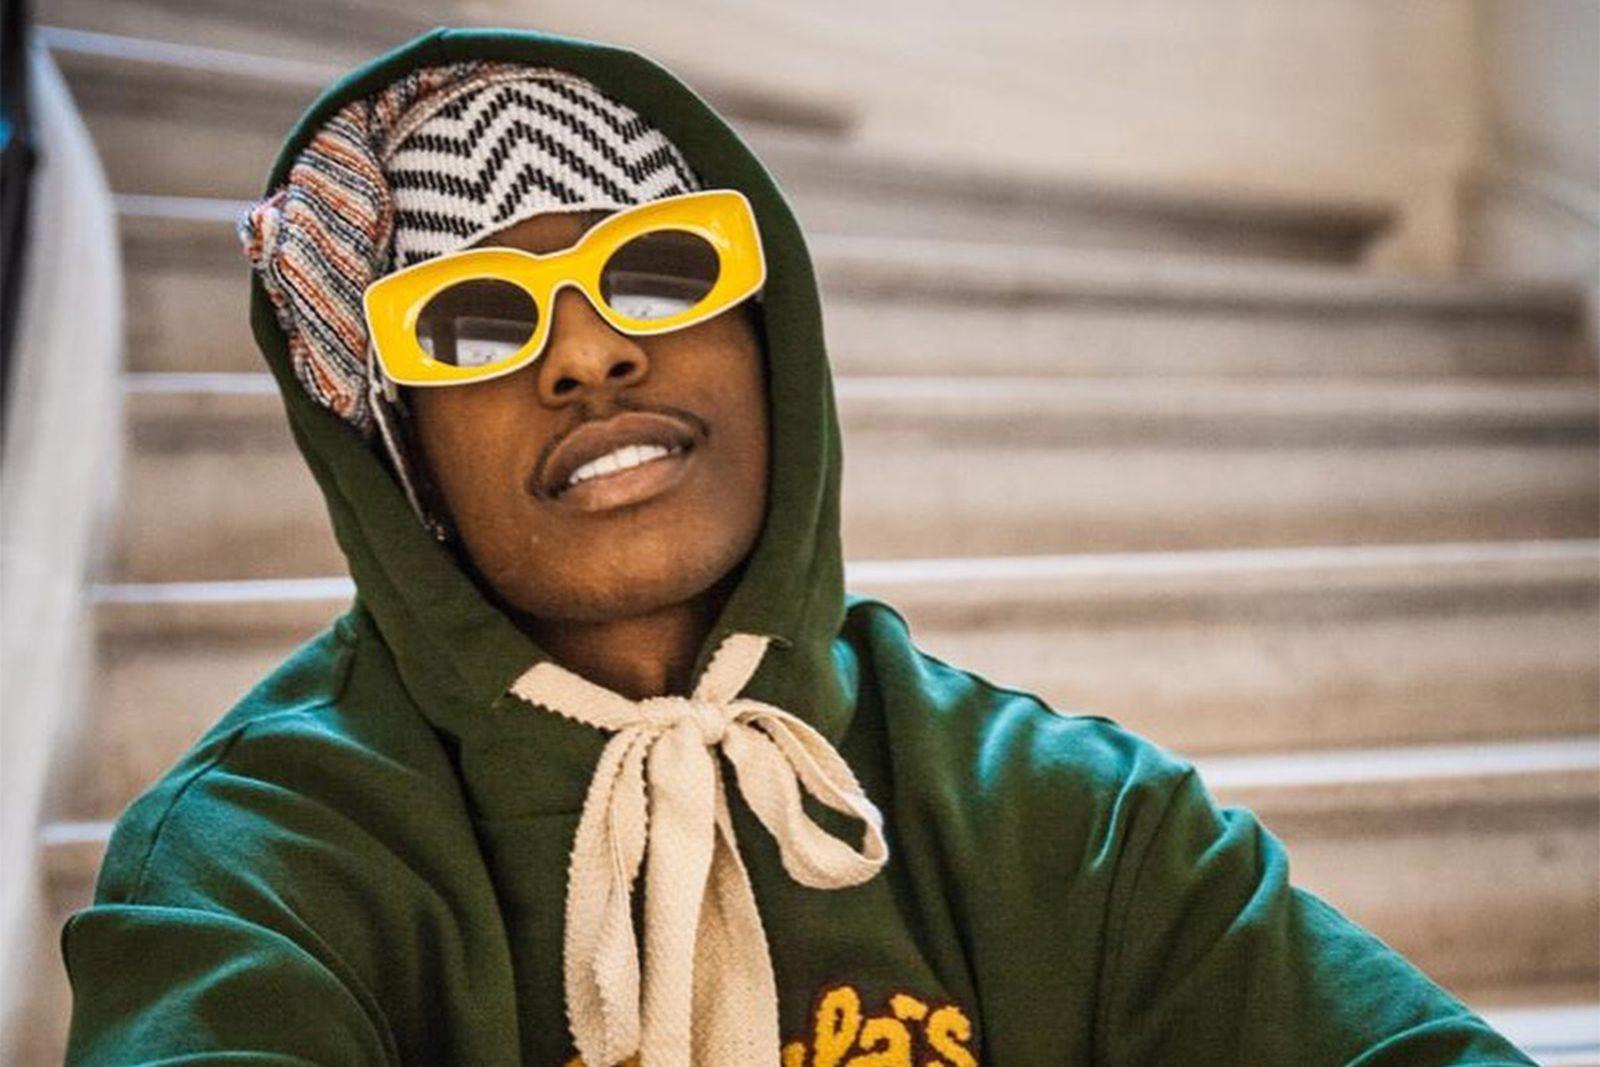 elon musk rap best comments roundup A$AP Rocky Adidas Loewe